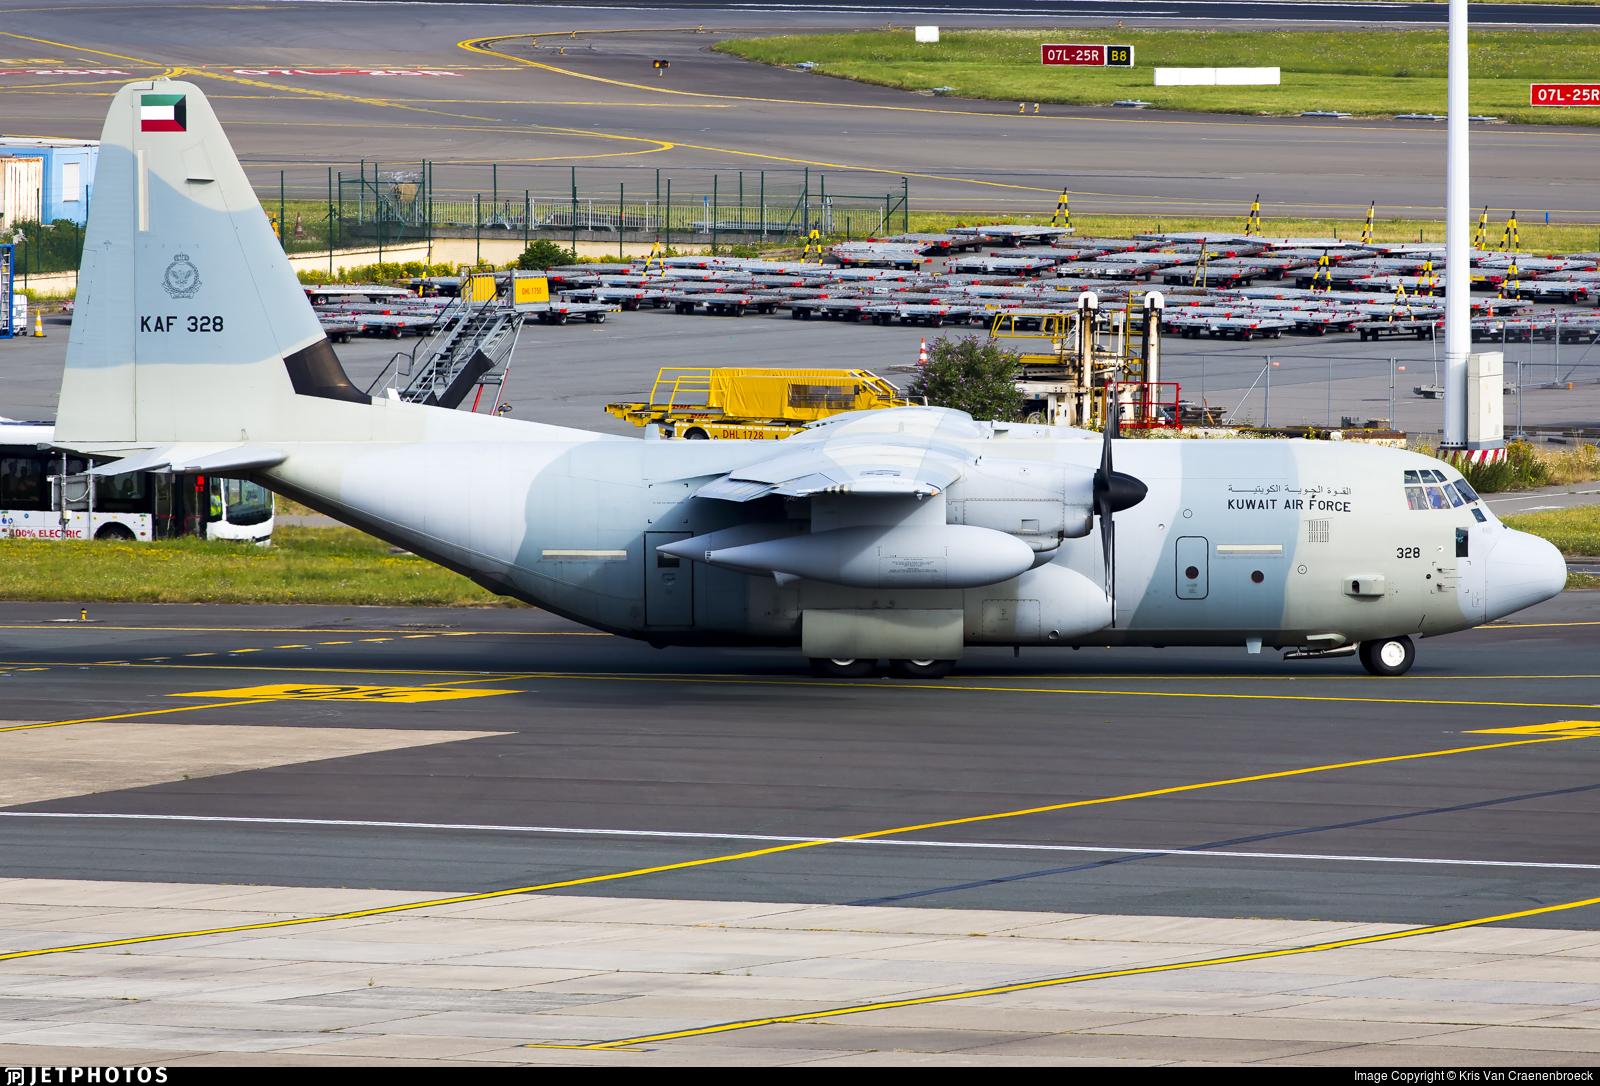 KAF328 - Lockheed Martin KC-130J Hercules - Kuwait - Air Force